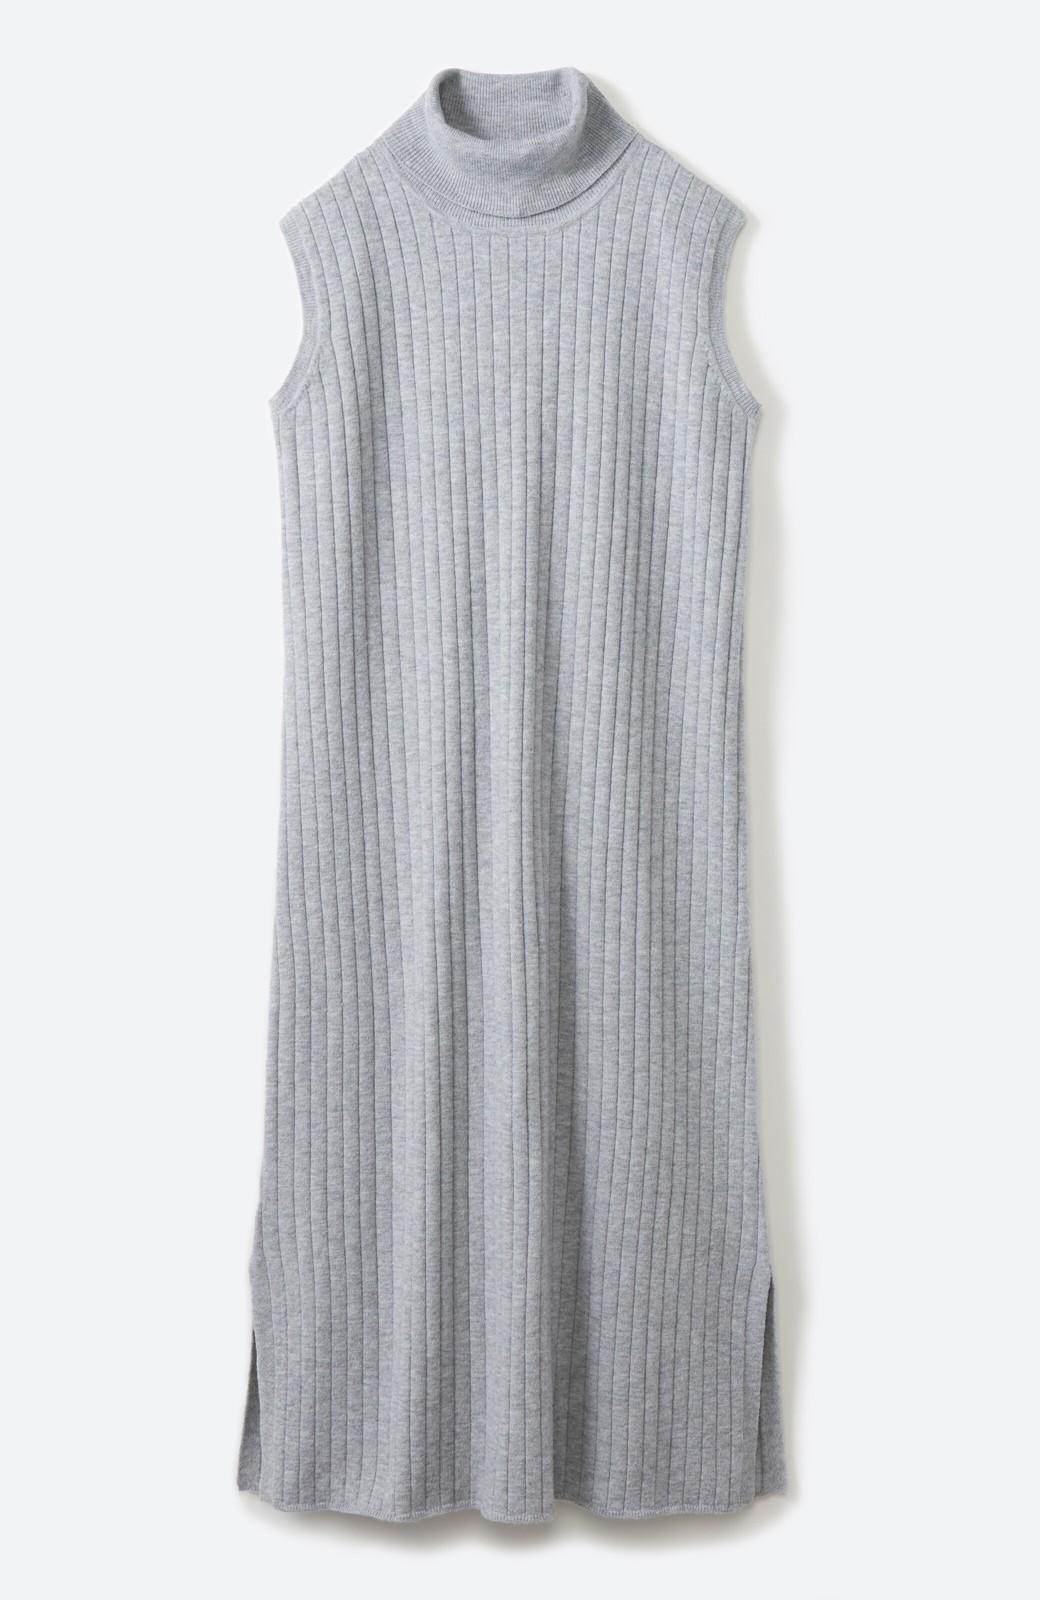 haco! セットで着るだけパッとかわいい ニットトップス&ノースリーブニットワンピースセット <グレー>の商品写真3